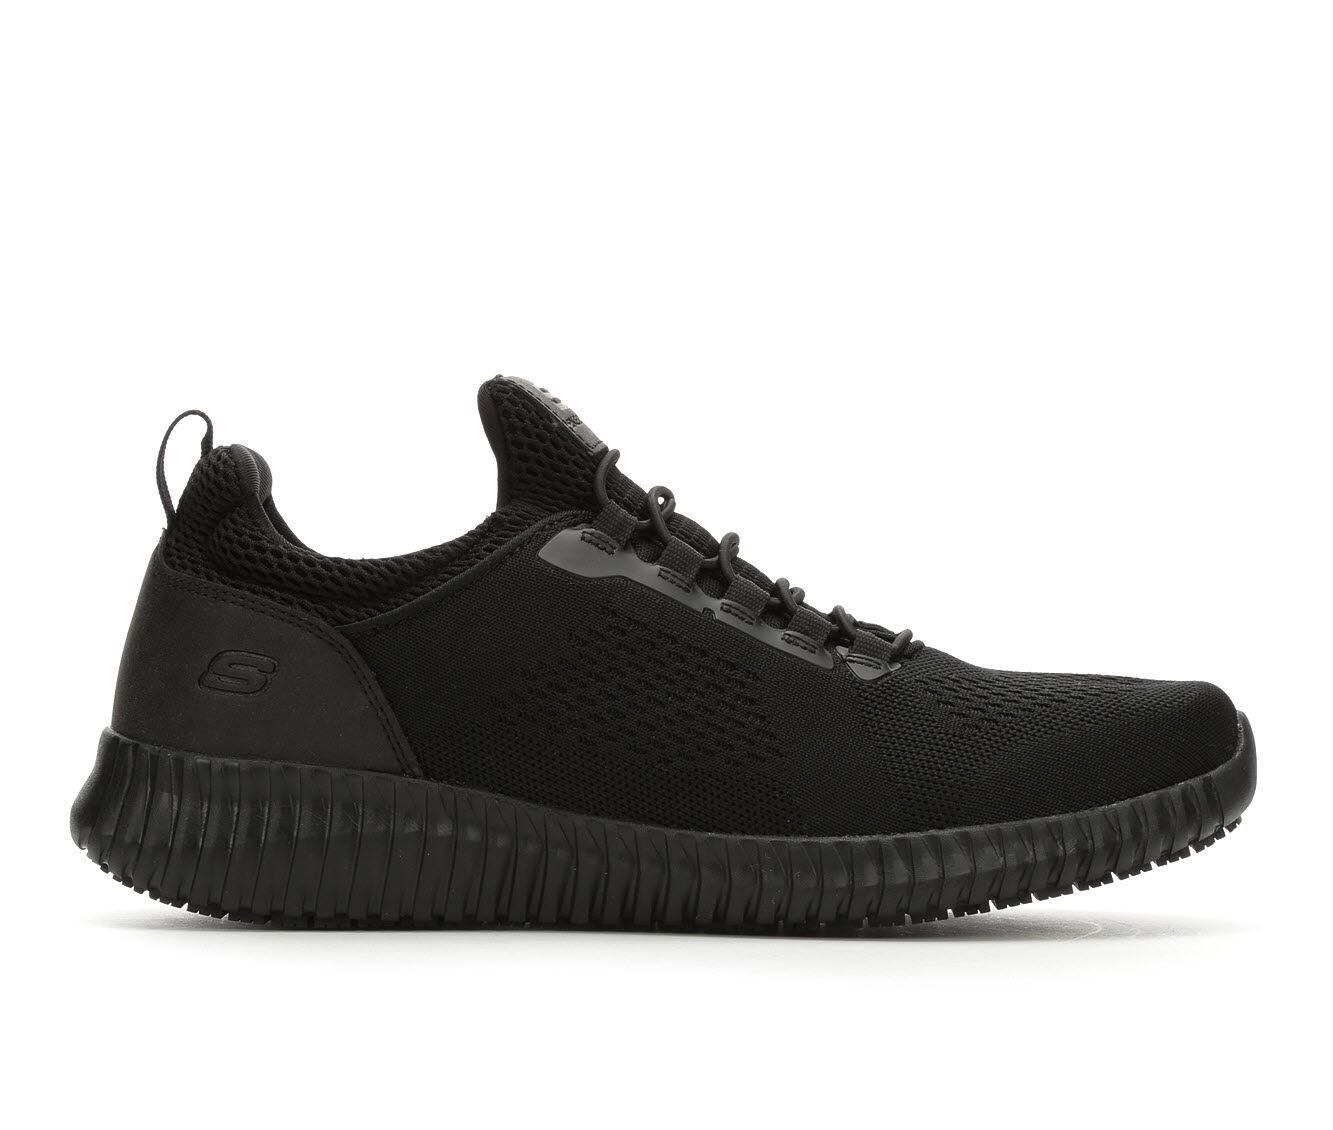 SKECHERS Work Cessnock Men's Slip Resistant Electrical Hazard Slip On Athletic Work Shoe